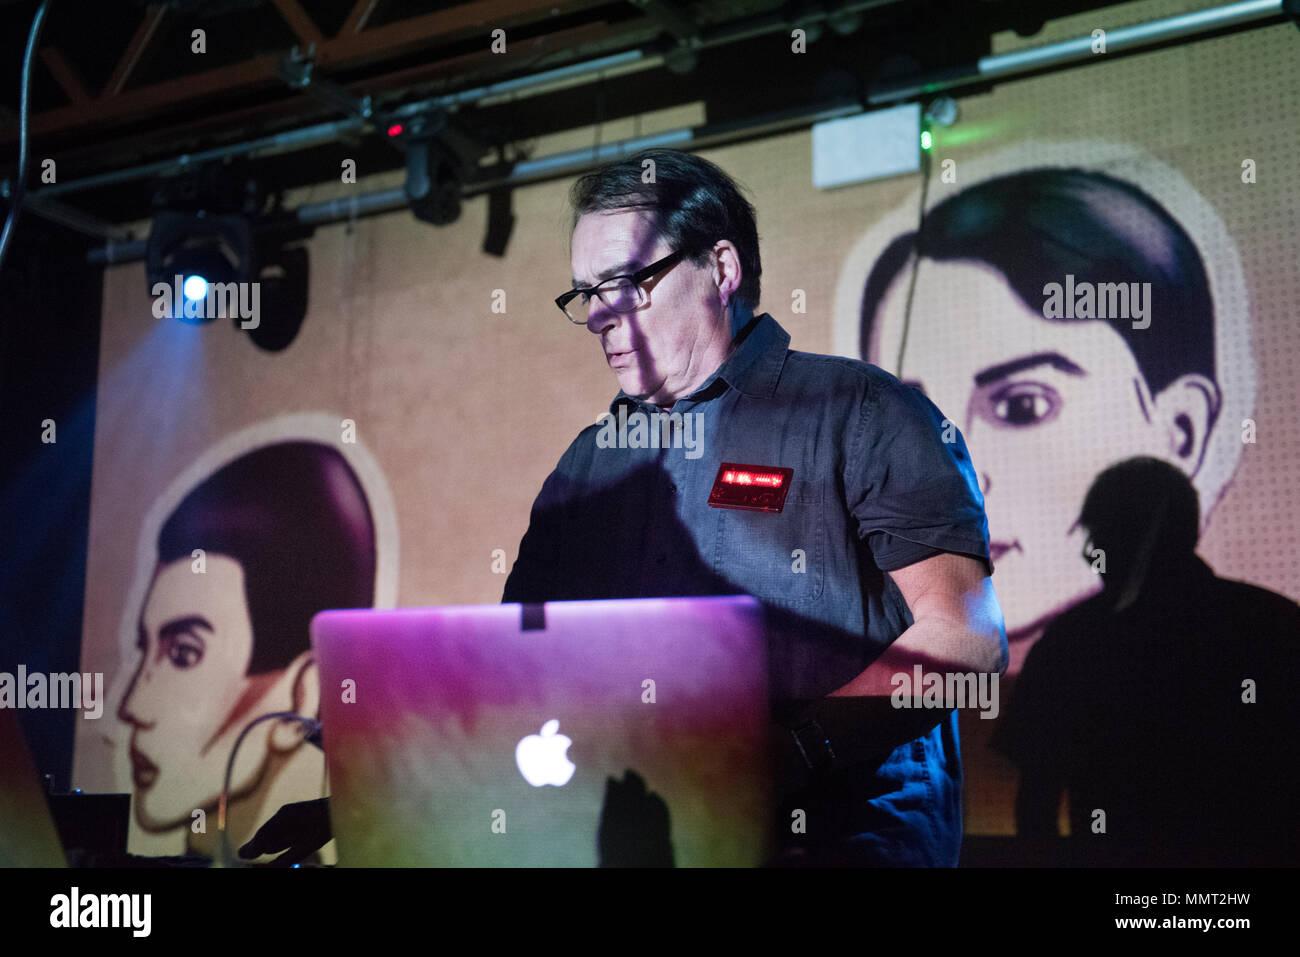 wolfgang flur former member of german electronic band kraftwerk performs a